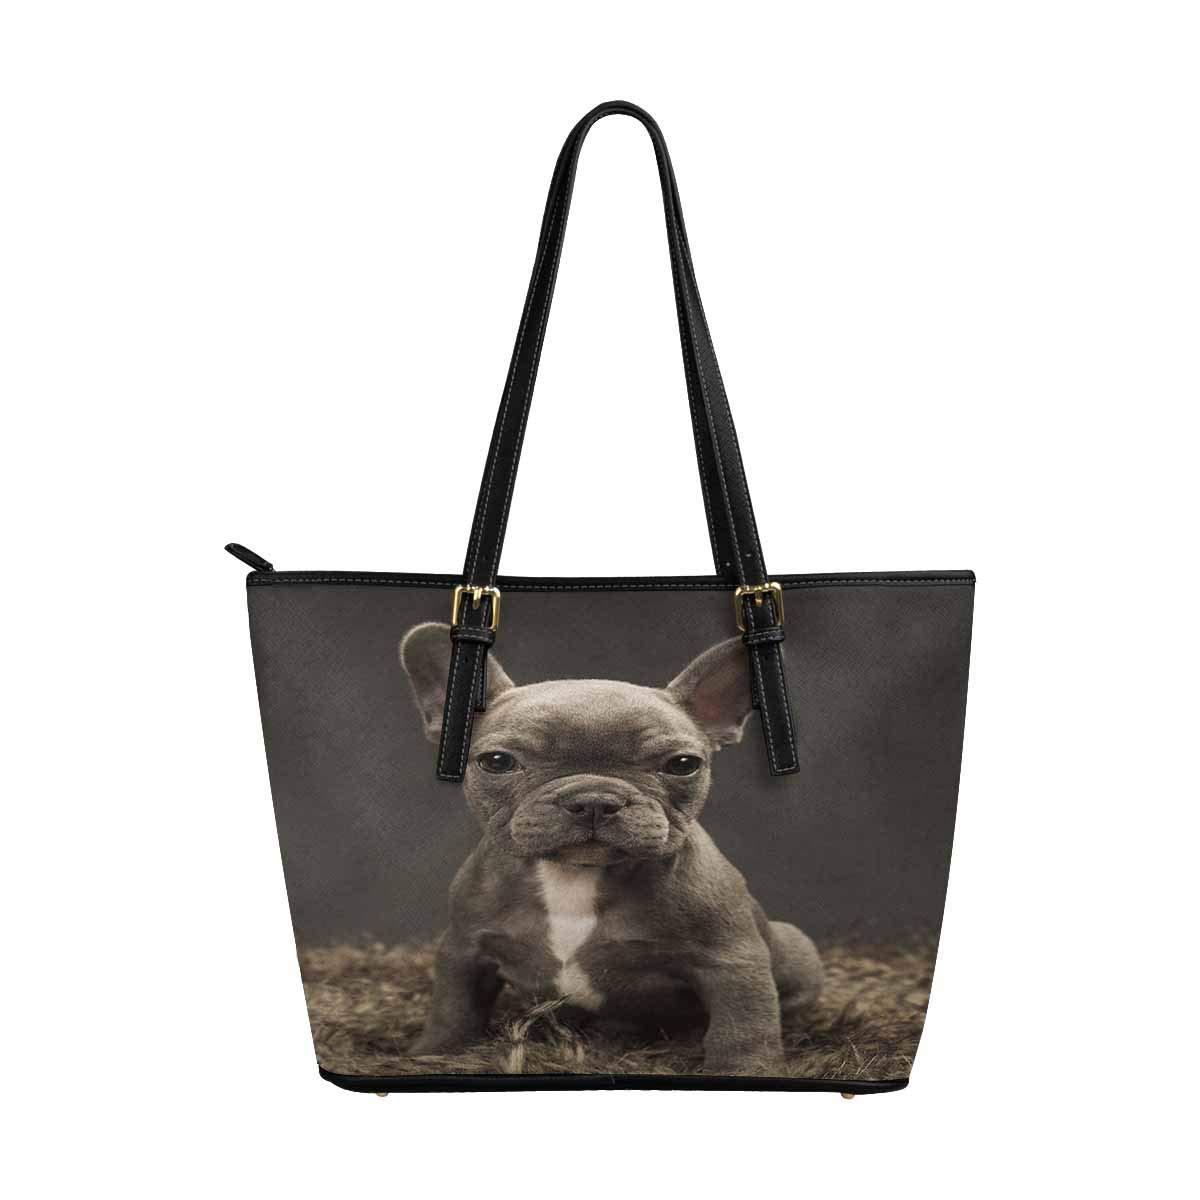 InterestPrint Top Handle Satchel HandBags Shoulder Bags Tote Bags Purse Baby French Bulldog Cute Puppy